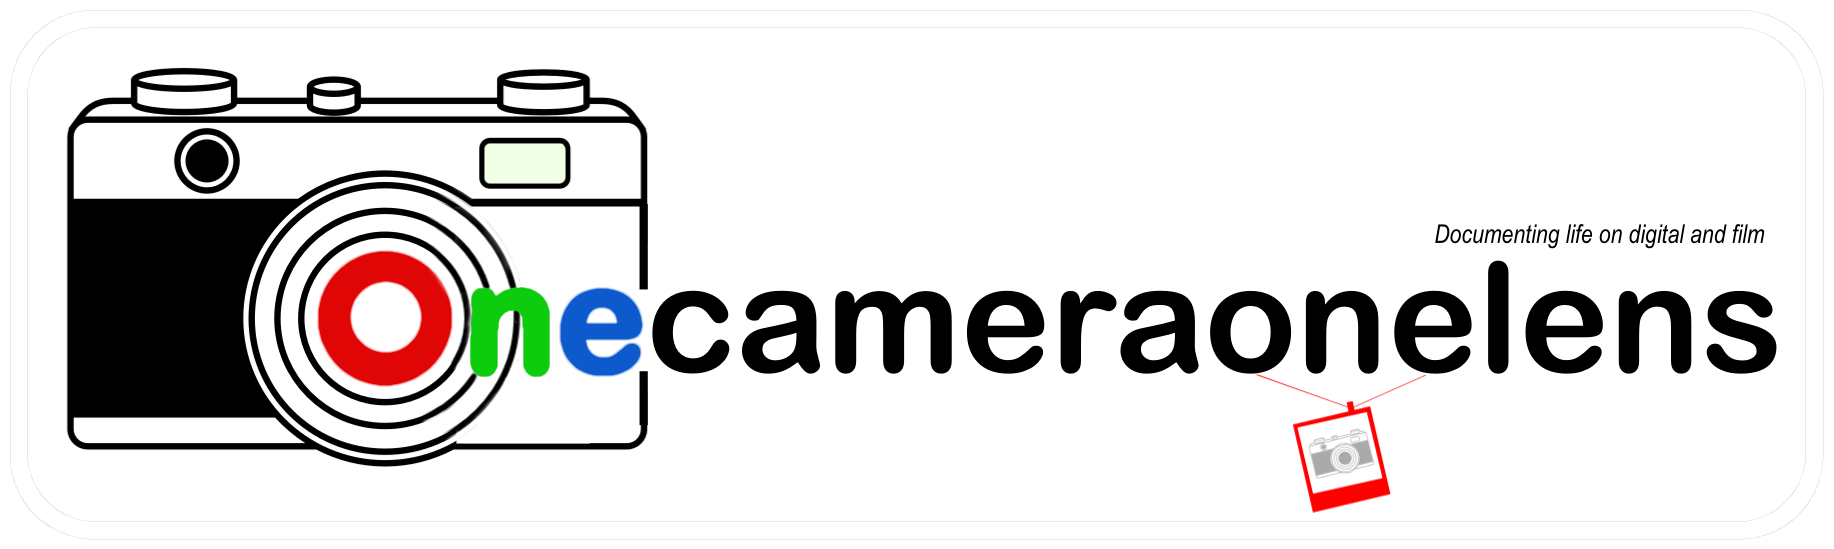 OneCameraOneLens